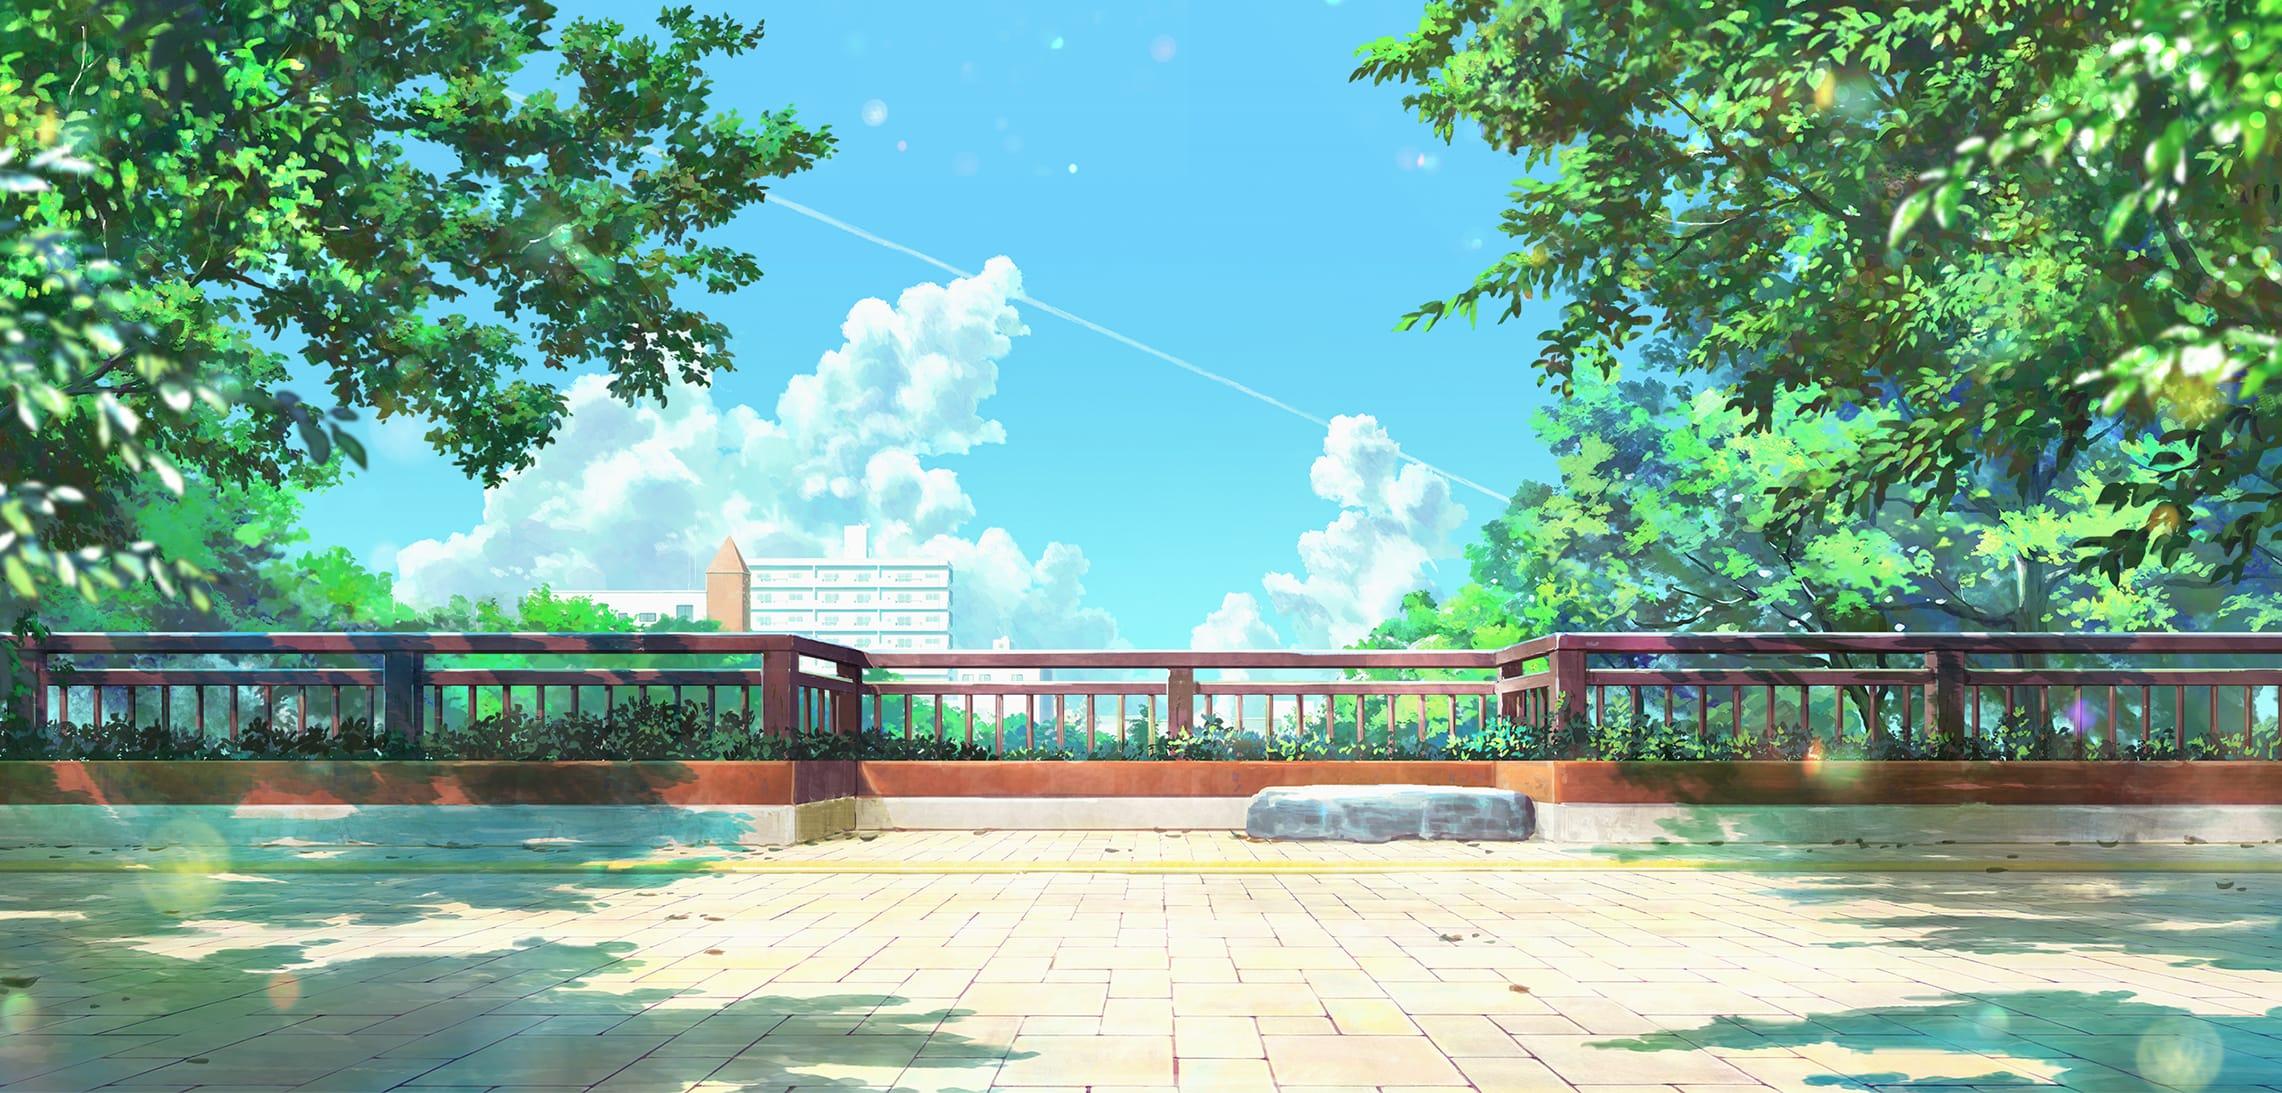 Image Result For Download Wallpaper Anime Kimi No Nawa